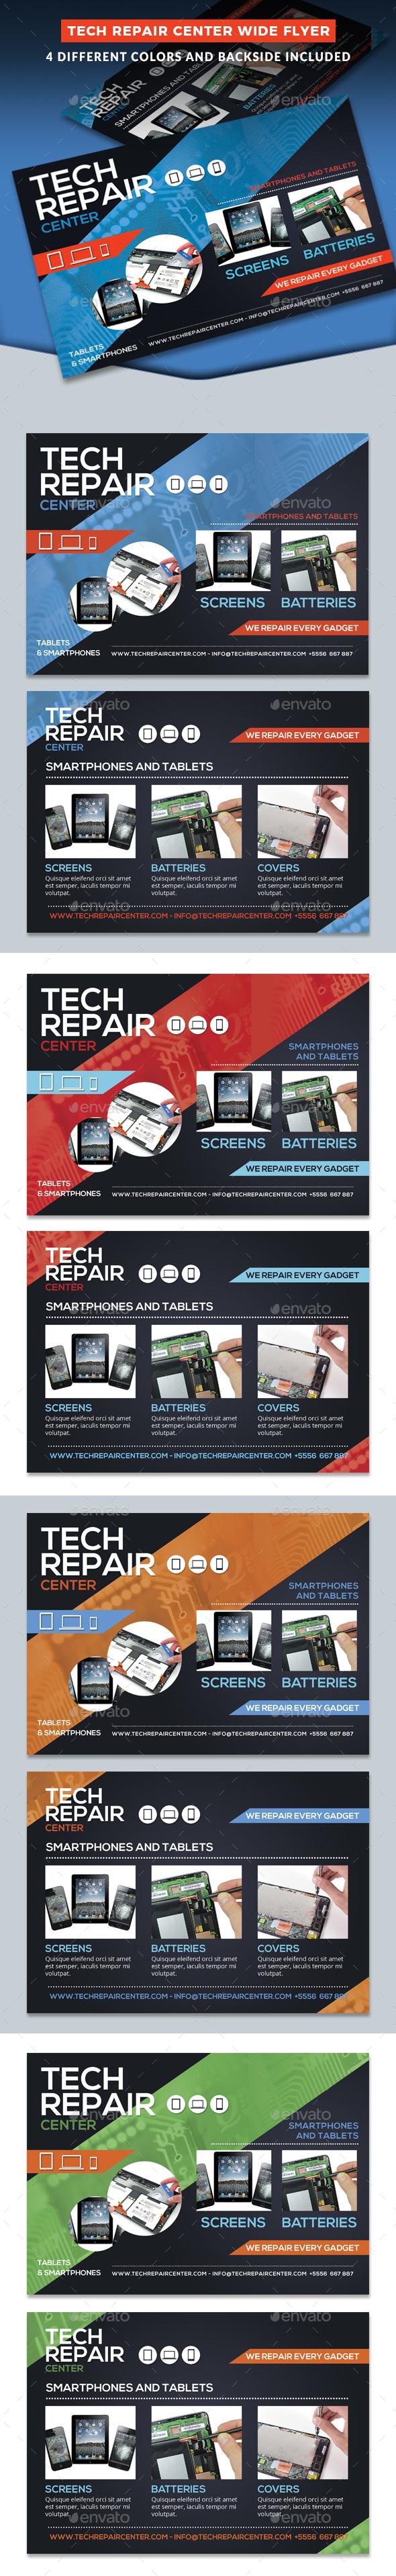 Tech Repair Center Wide Flyer Template - Commerce Flyers